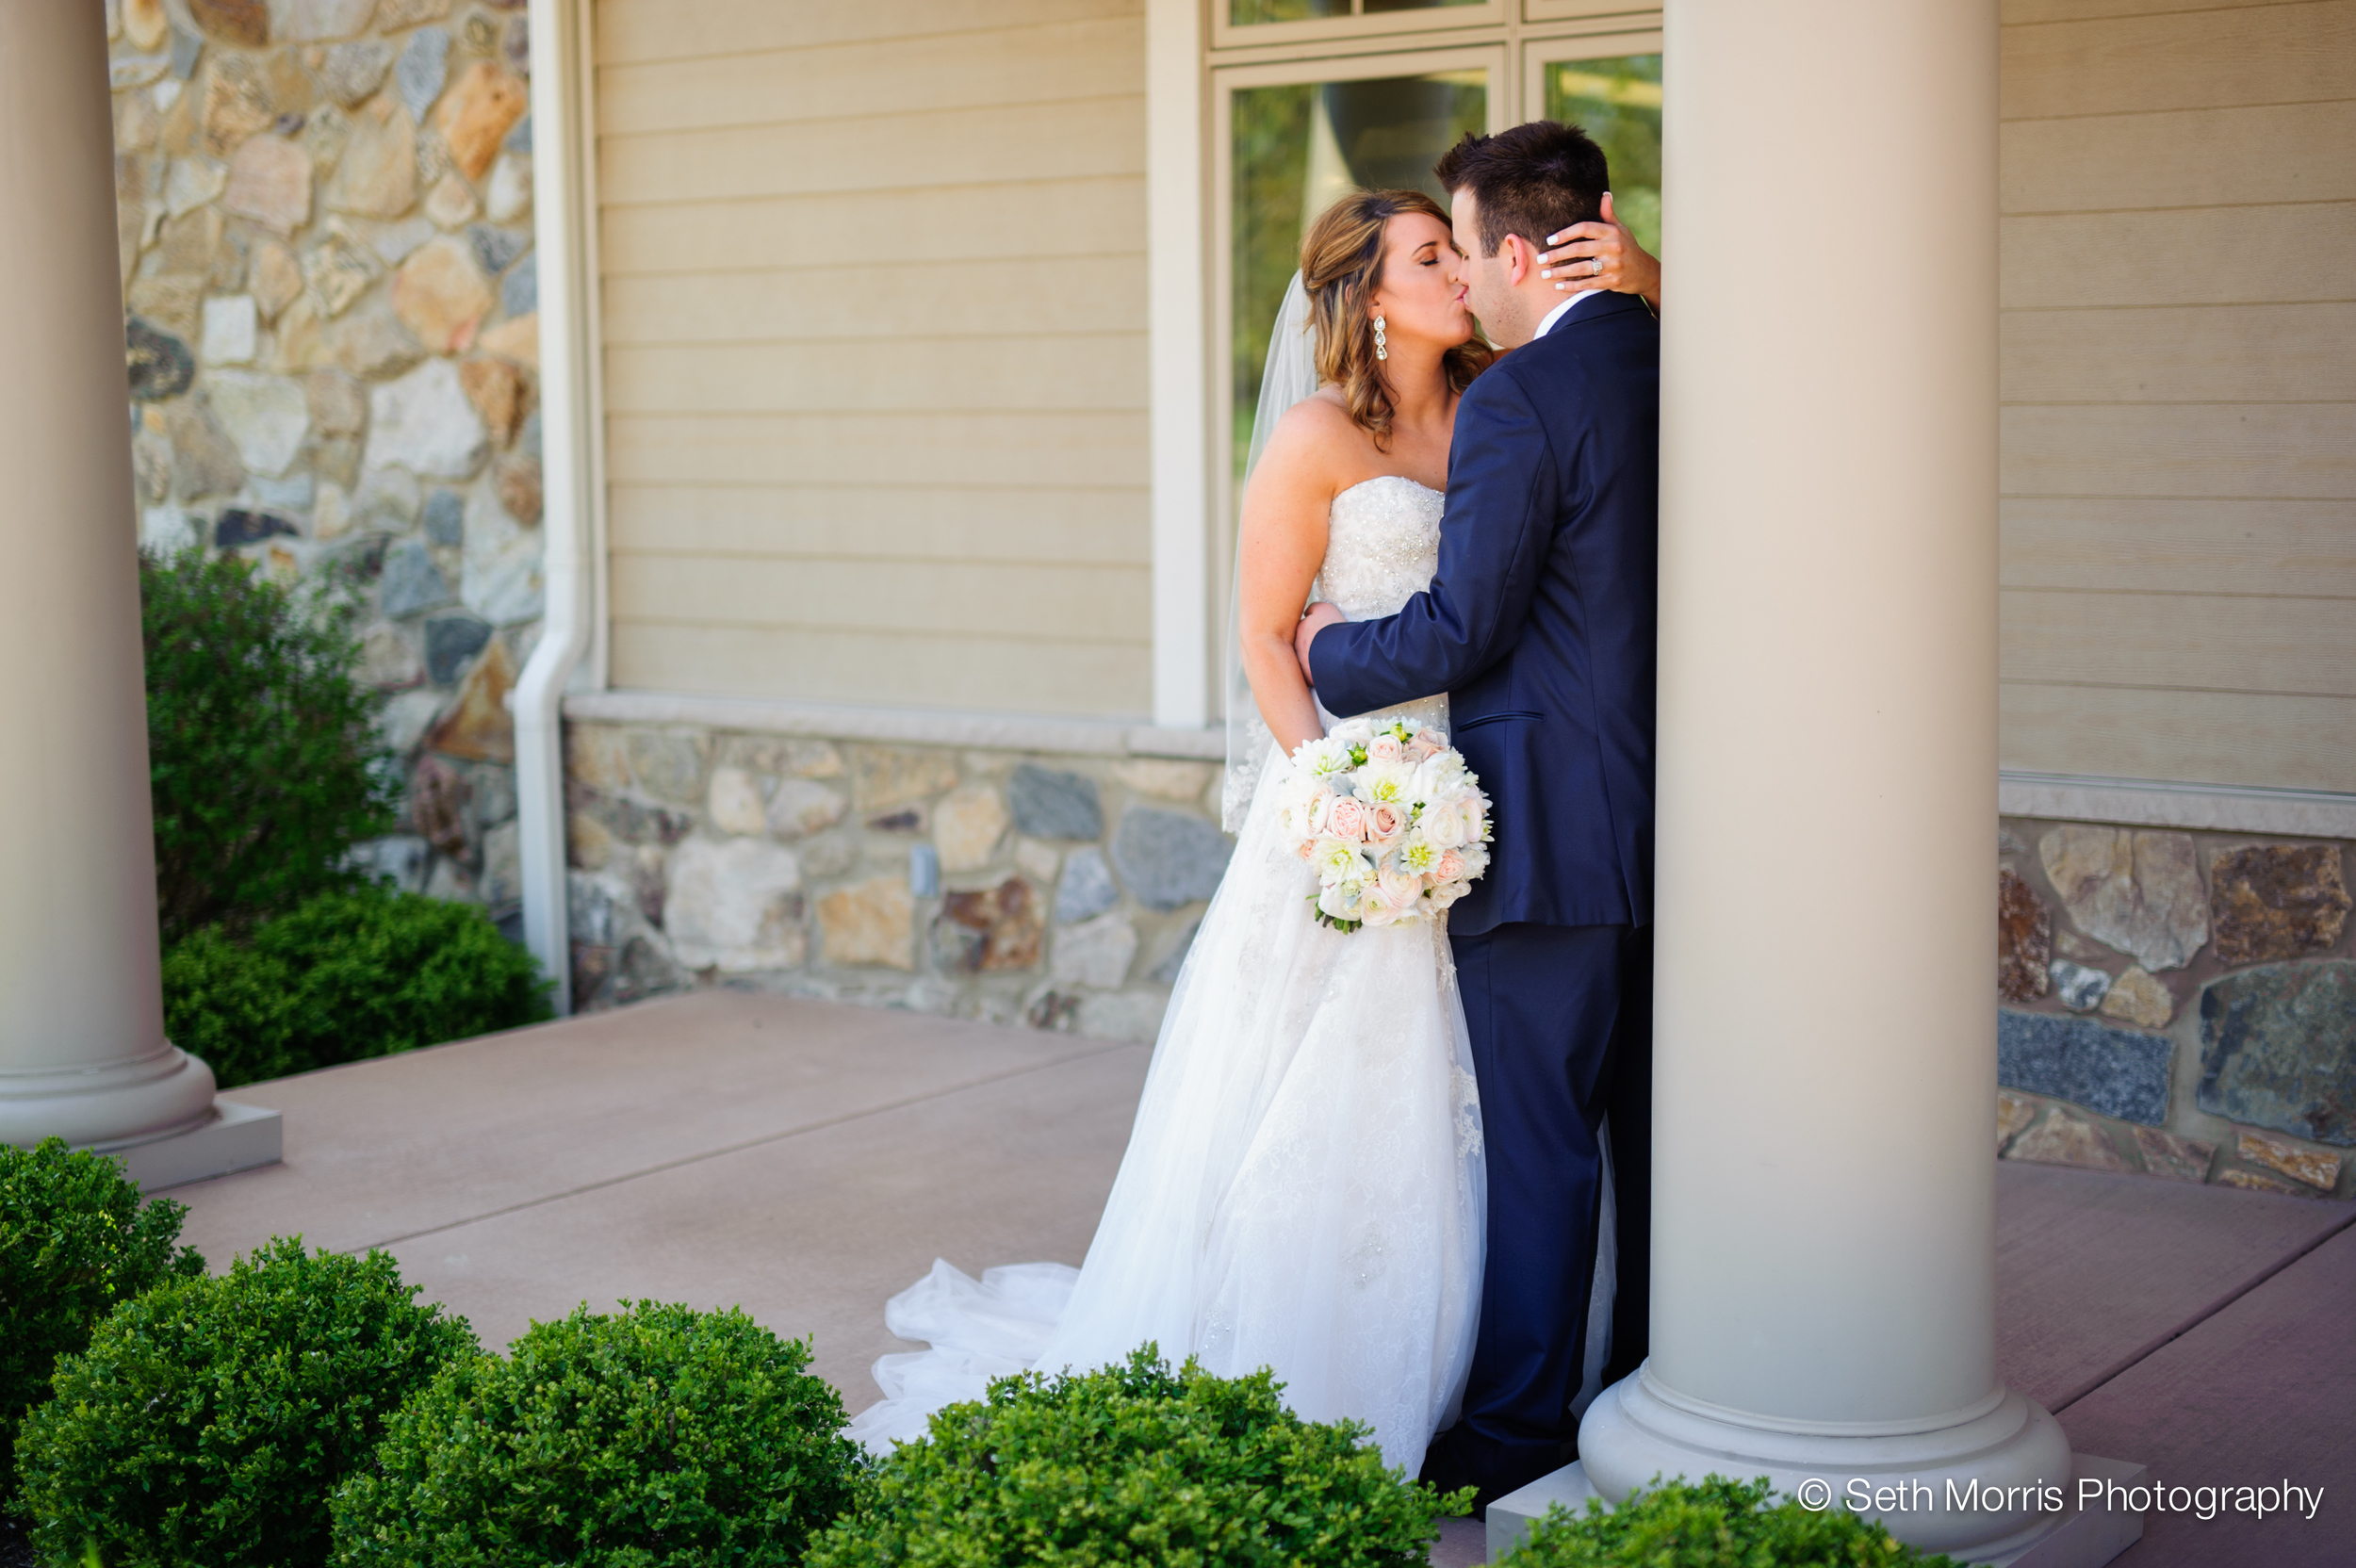 metamora-fields-wedding-photographer-peoria-124.jpg